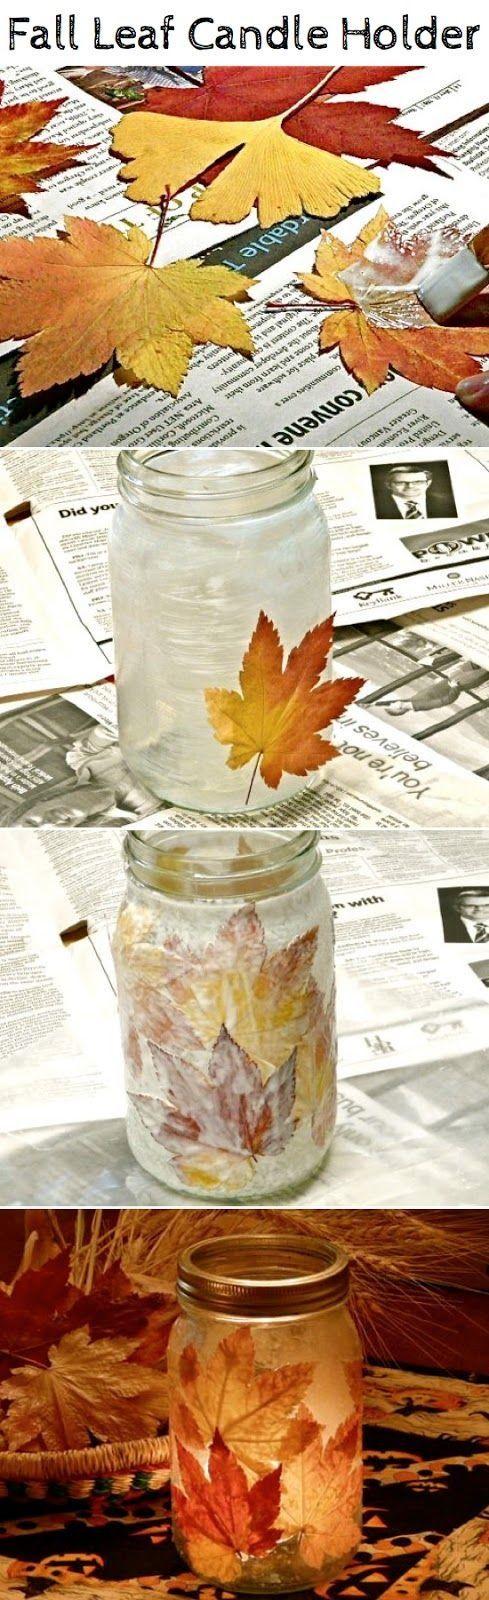 Fall Mason Jar Idea!